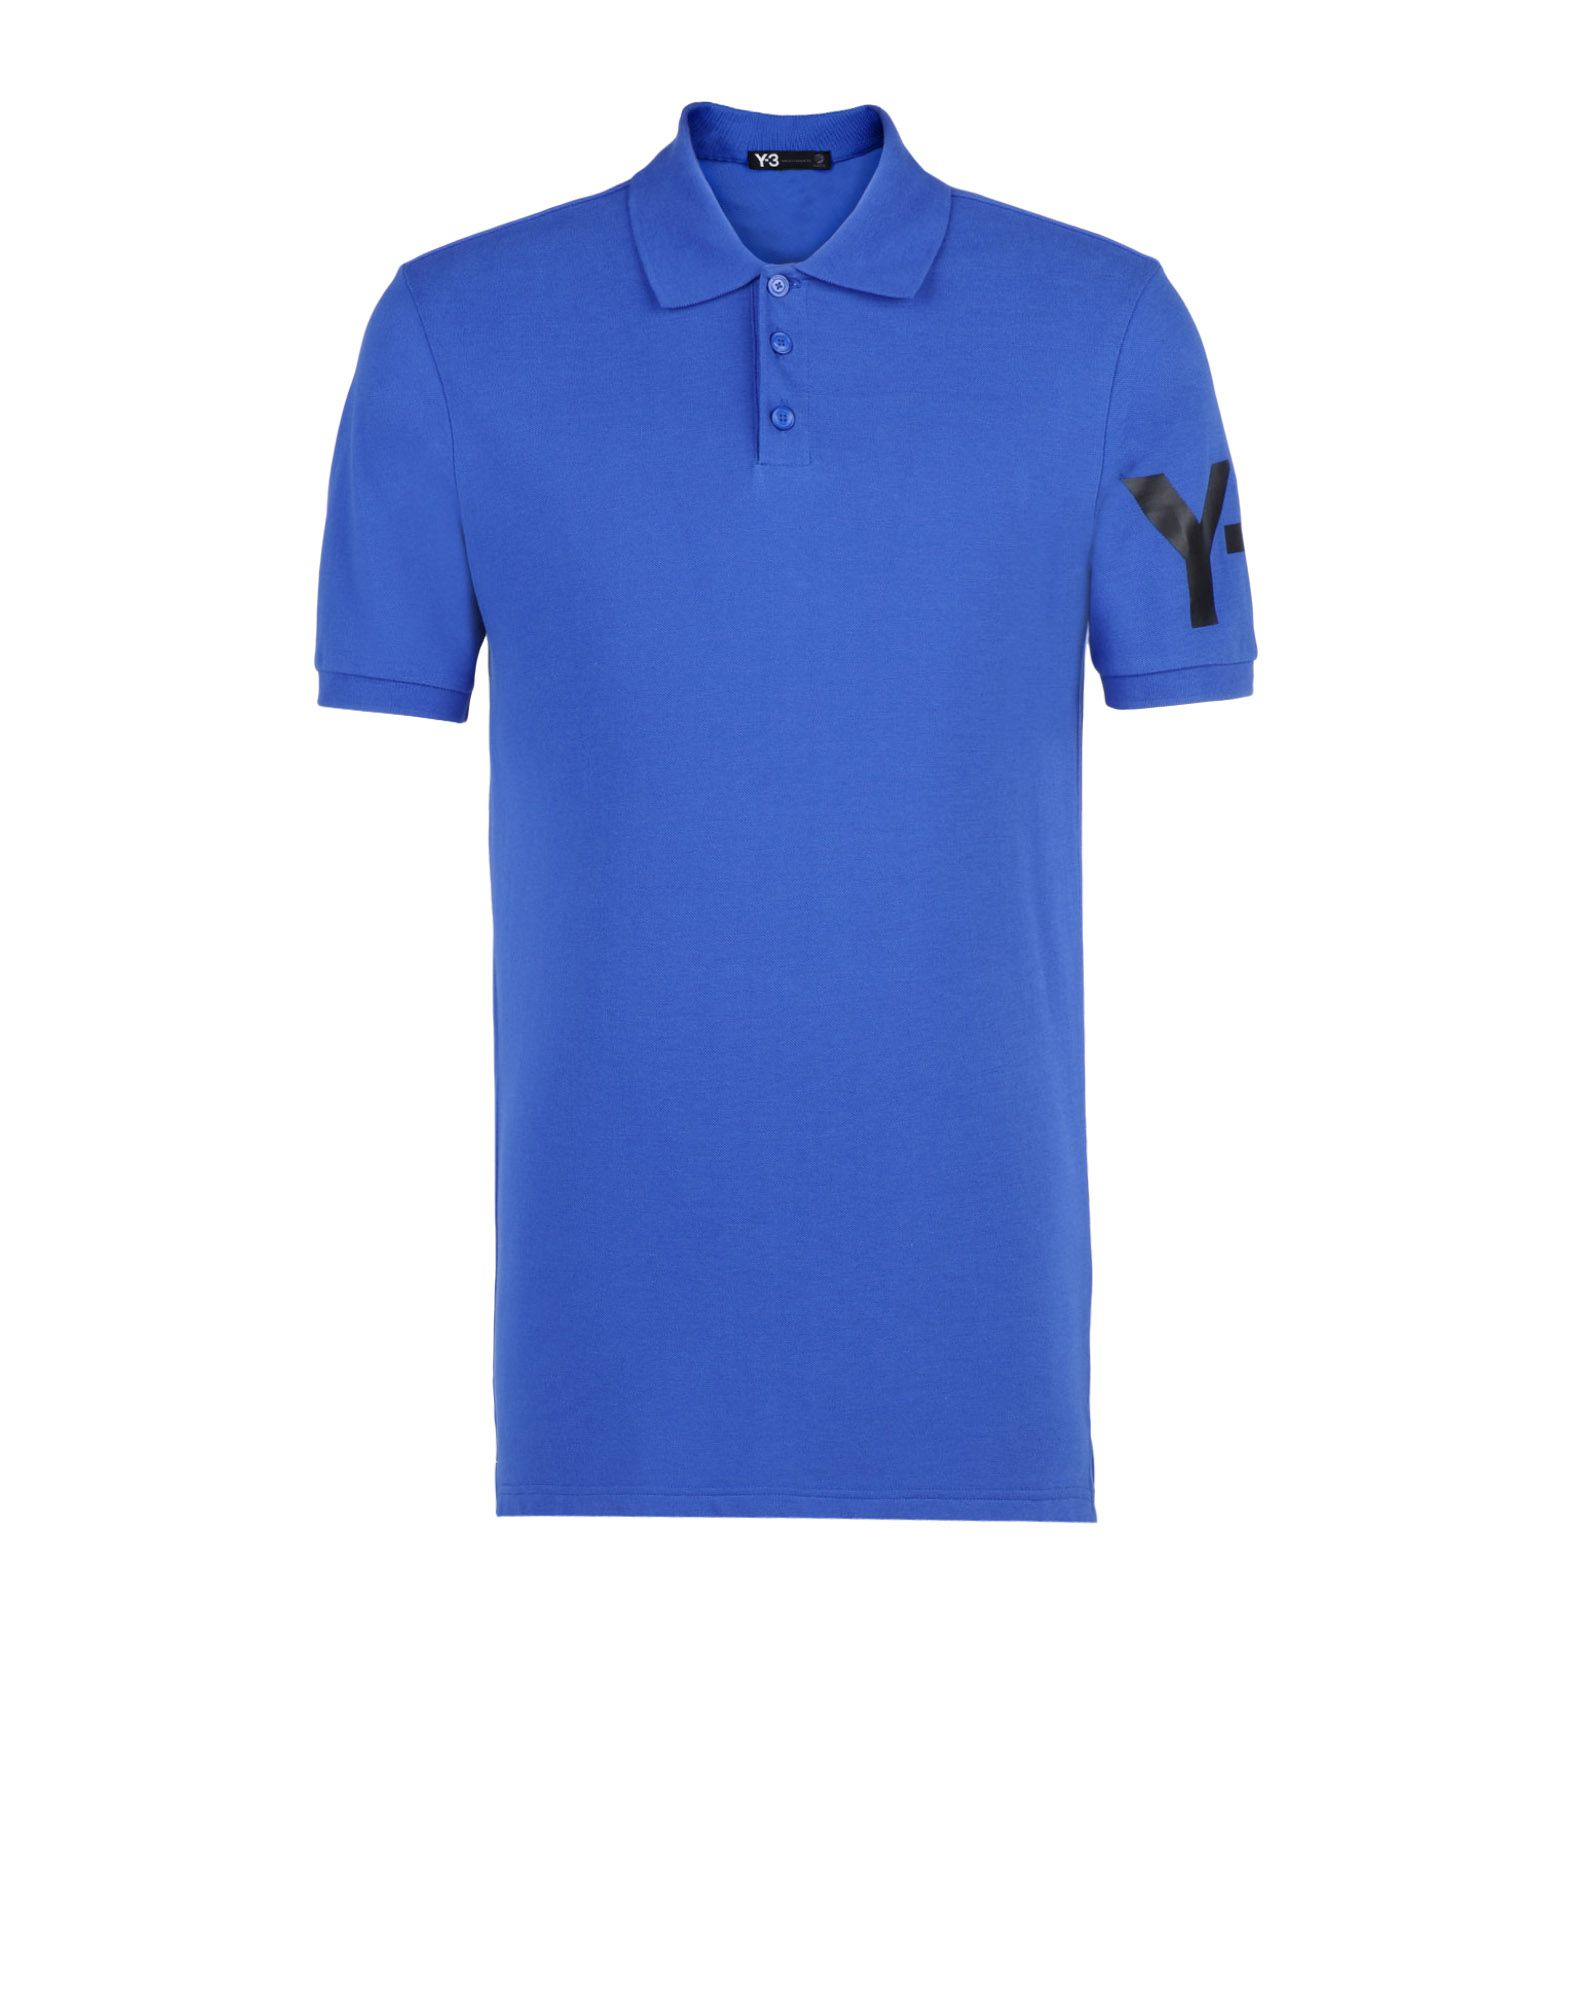 4f6bf47b  Y 3 CLASSIC POLO Polo   Adidas Y-3 Official Site